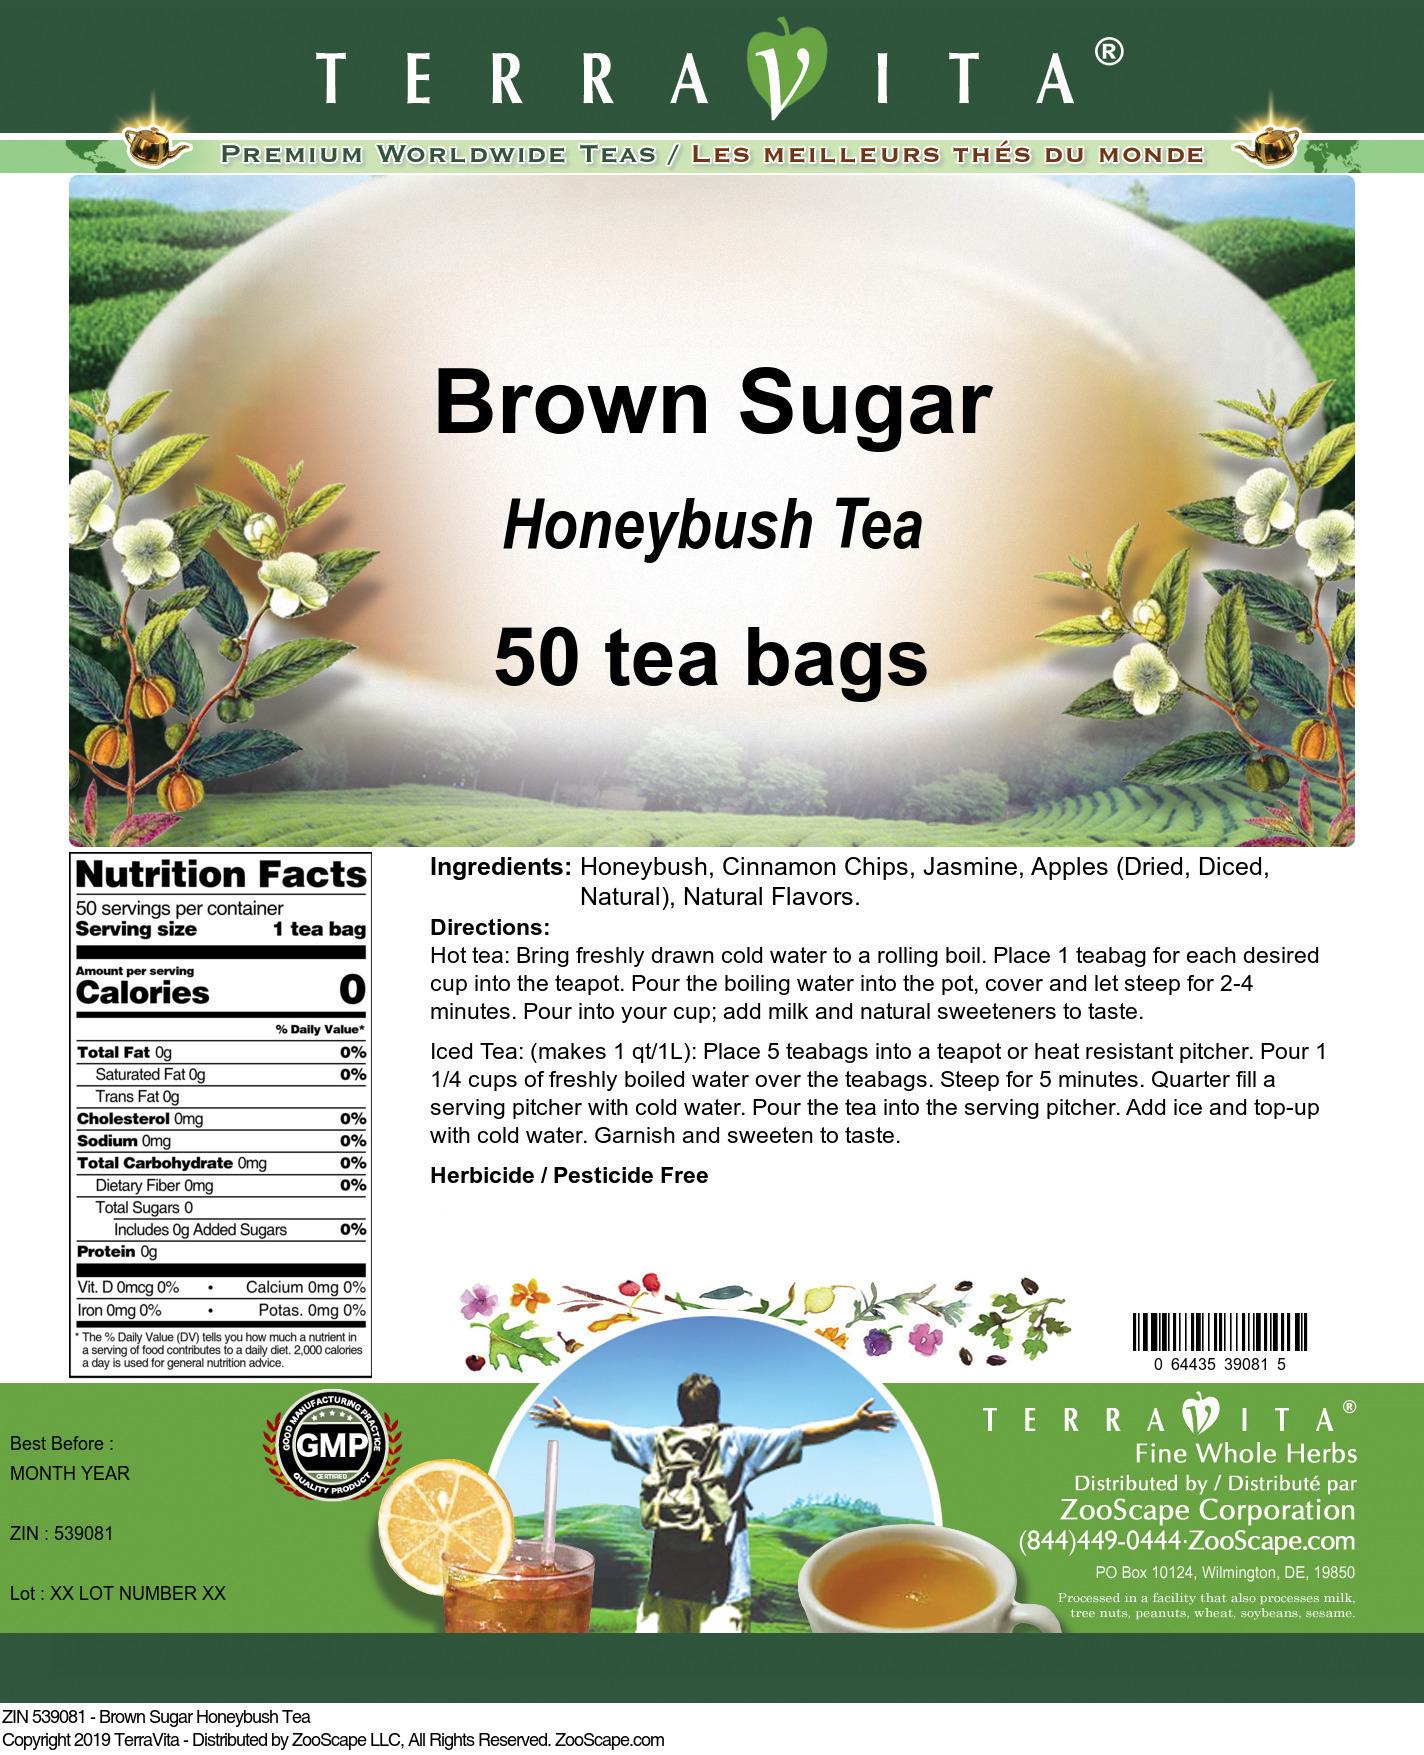 Brown Sugar Honeybush Tea